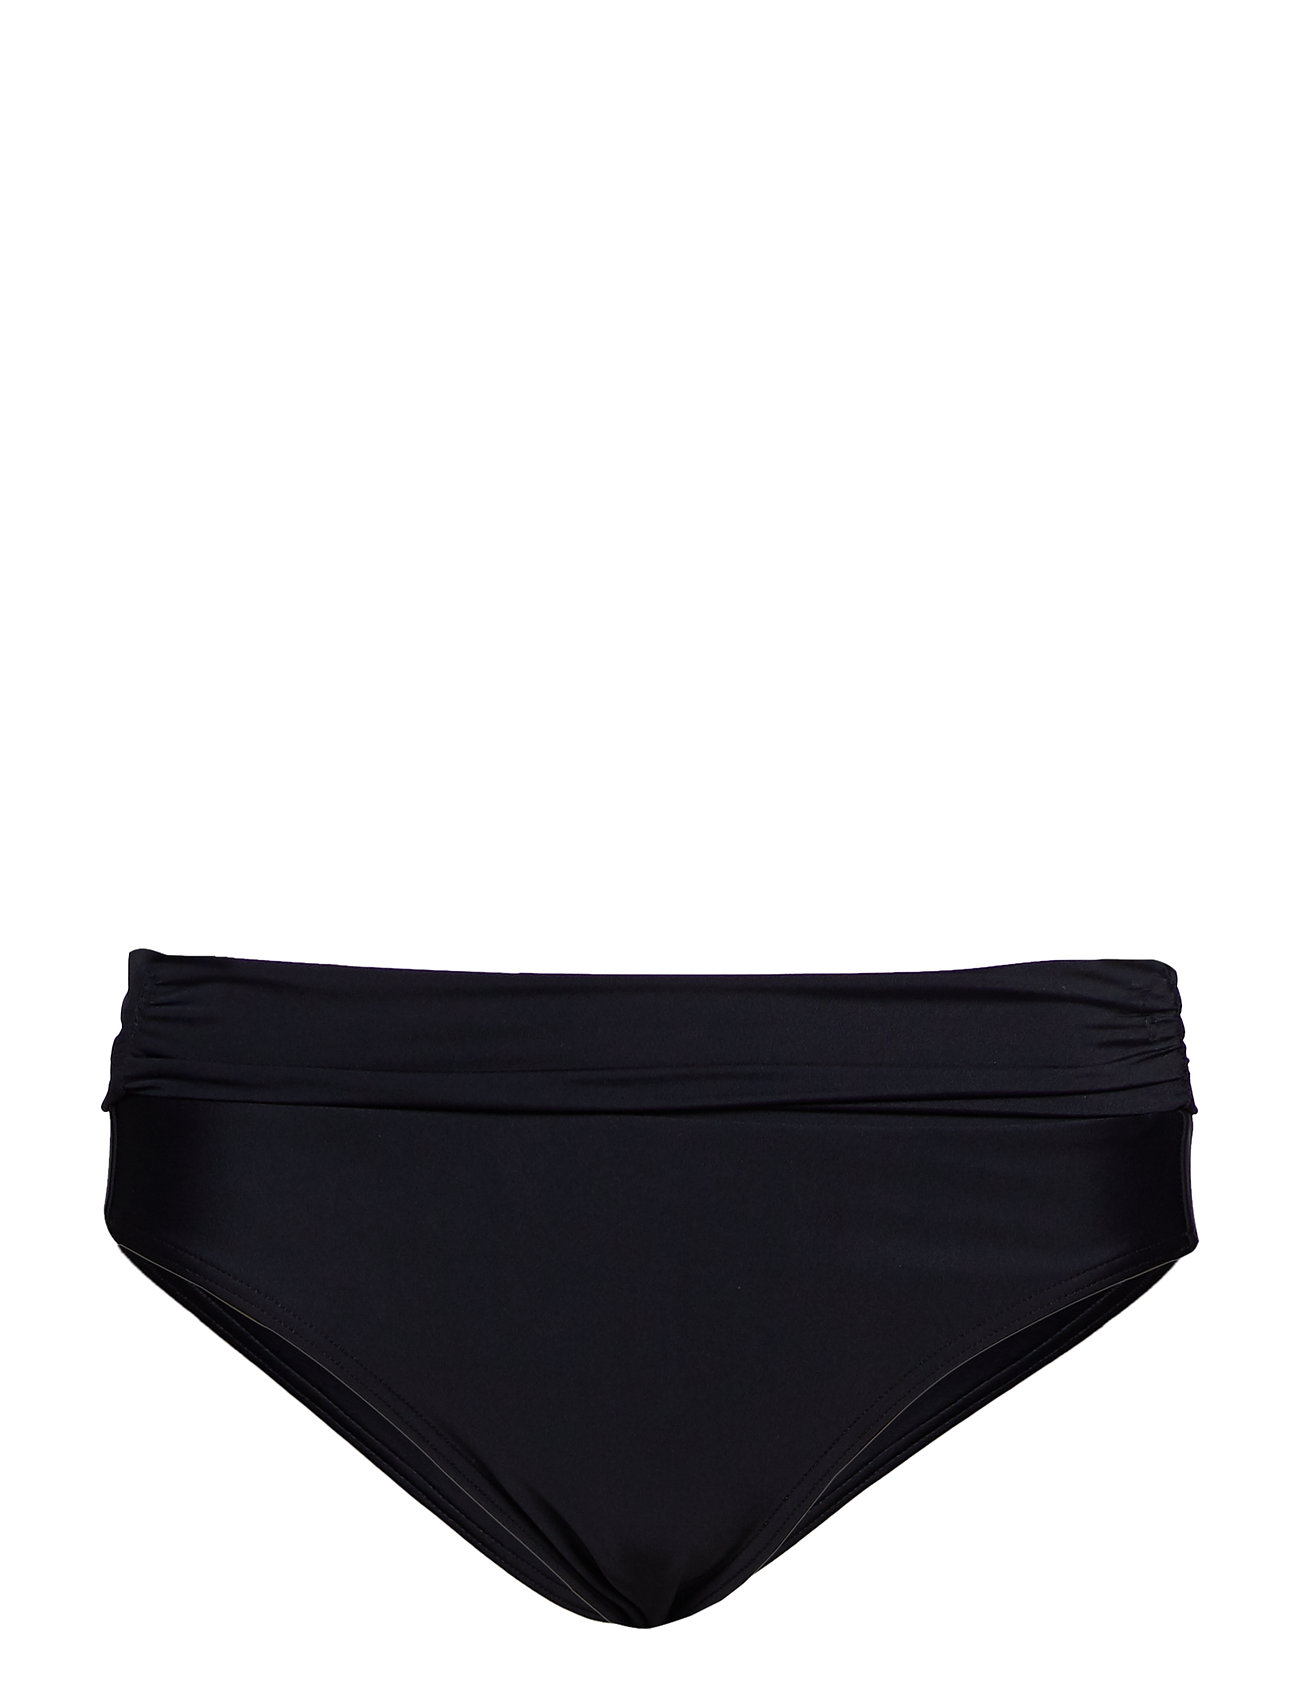 Image of Swim Tai De Luxe Bikinitrusser Sort Wiki (3086028833)